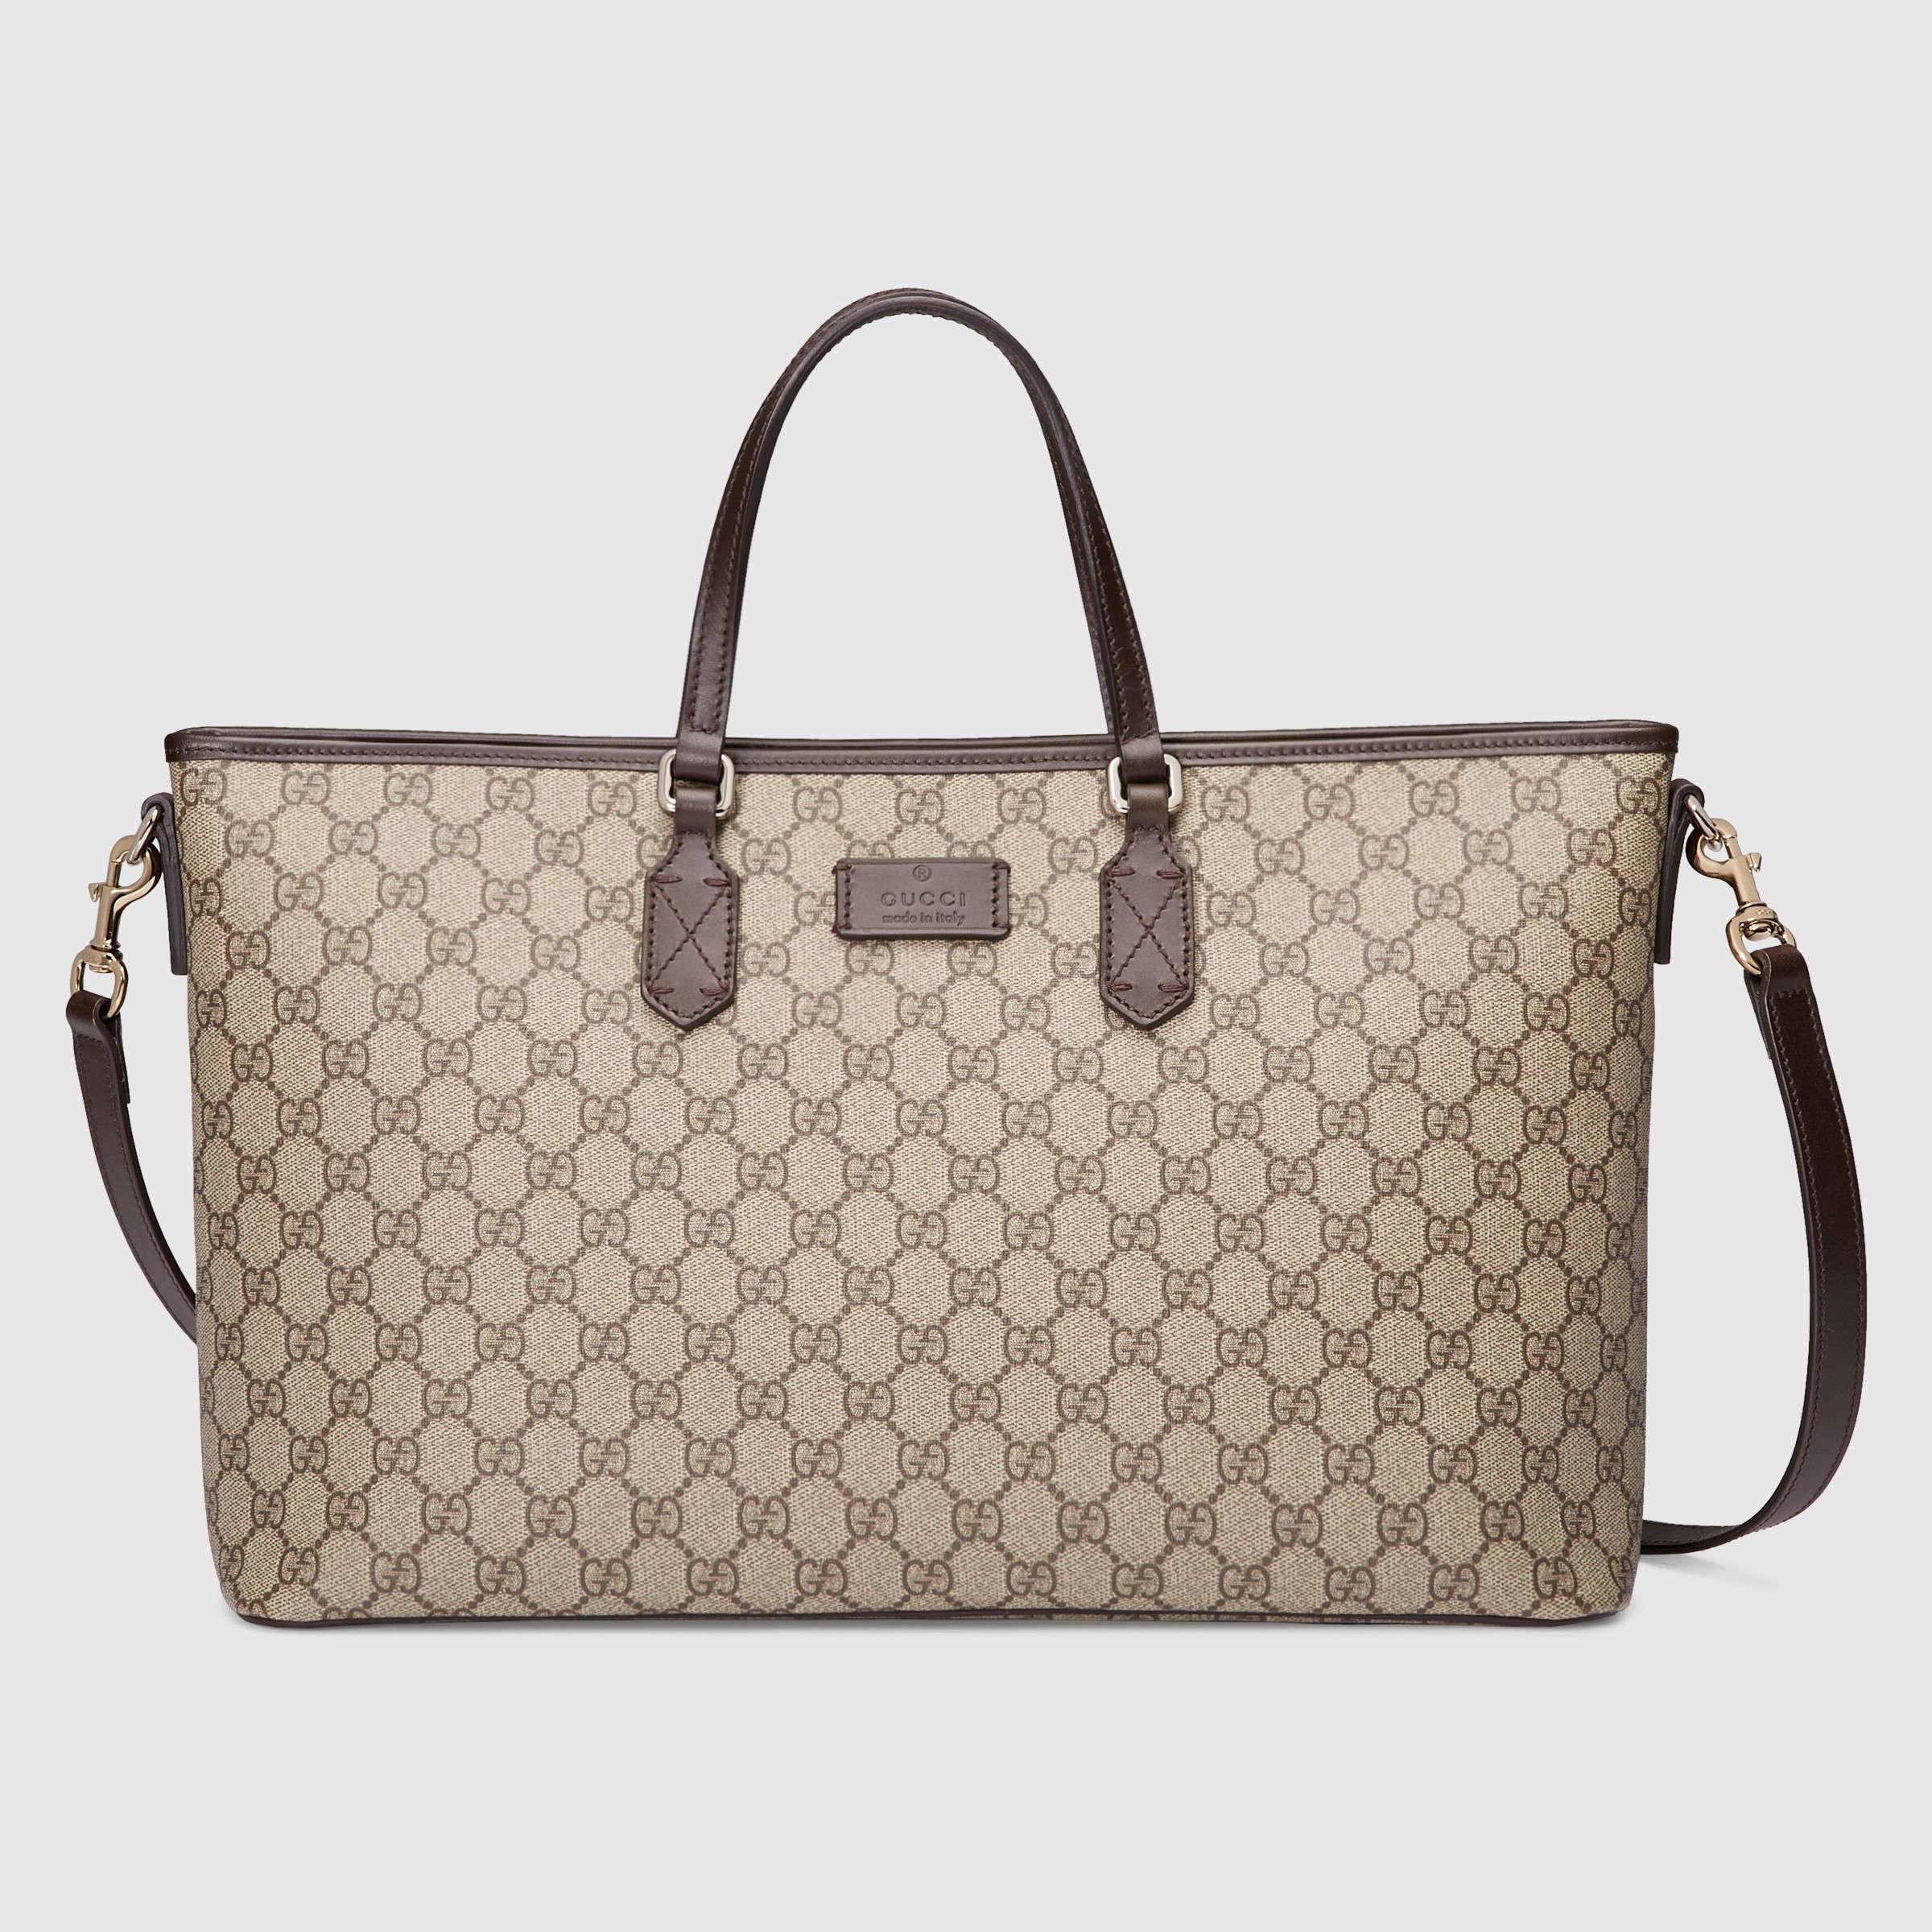 Iphone  Cases Louis Vuitton Uk